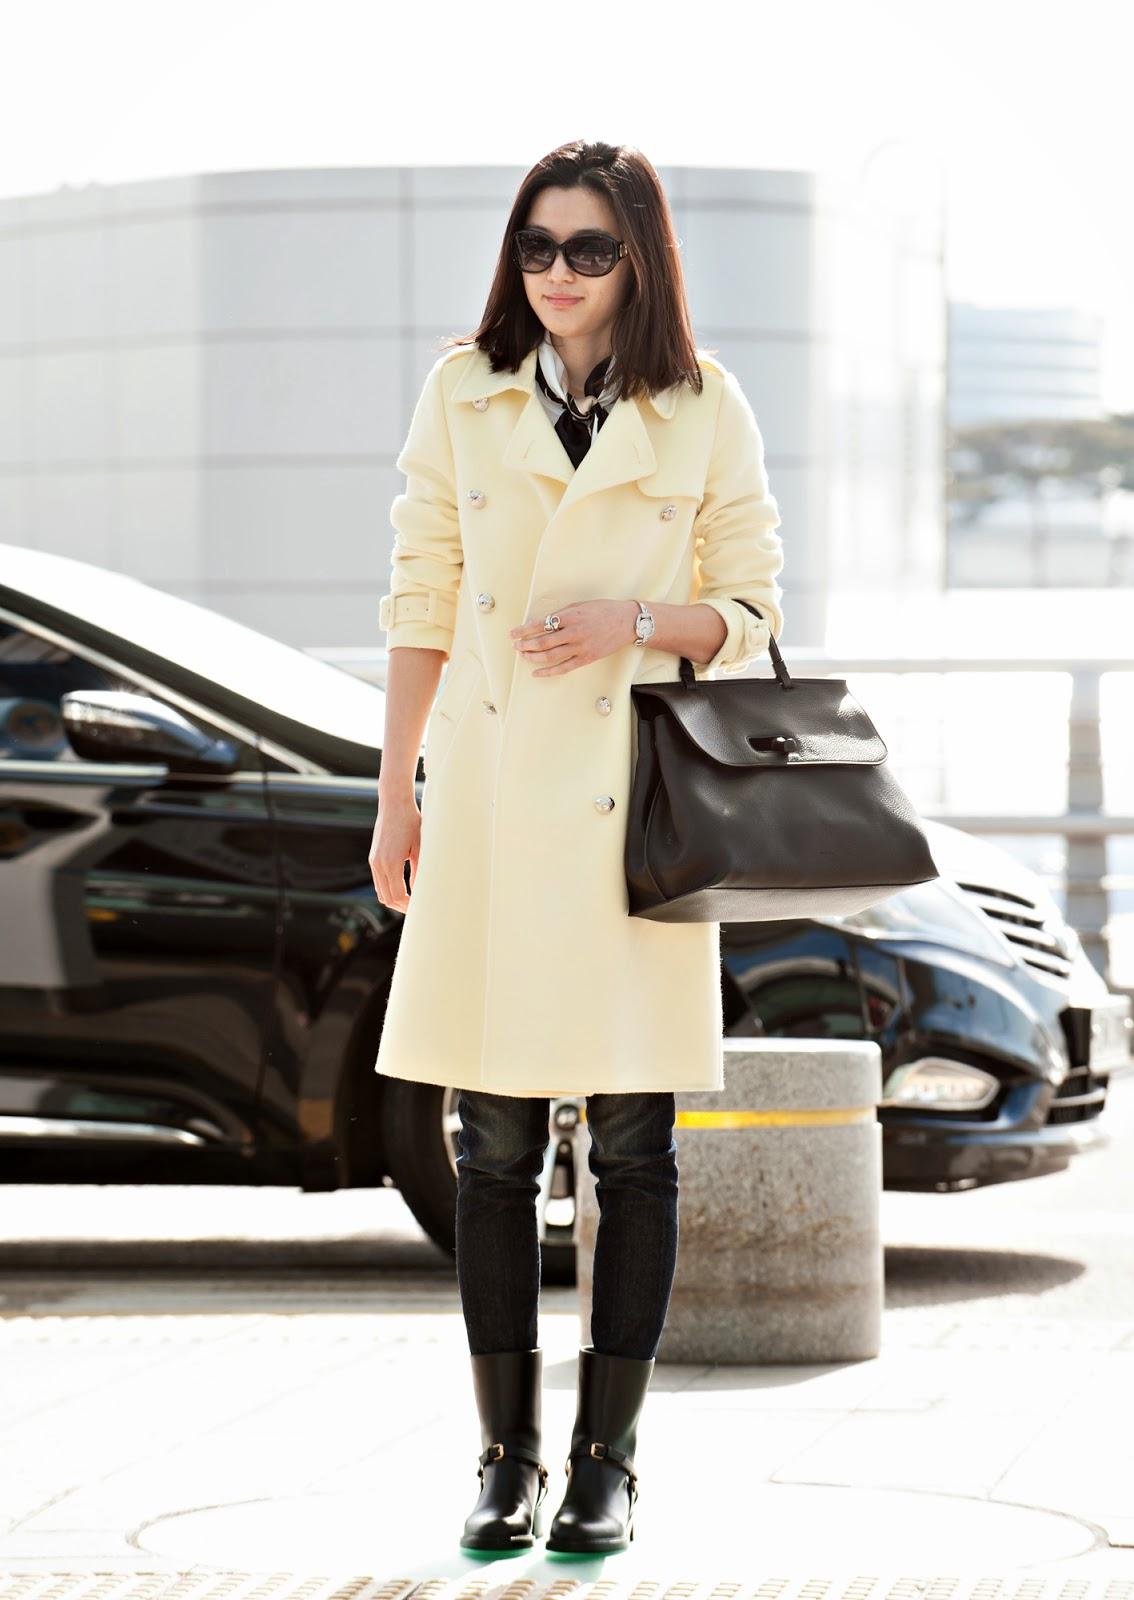 Korean Actress Gianna Jun as Face of Gucci's New Ad Campaign!